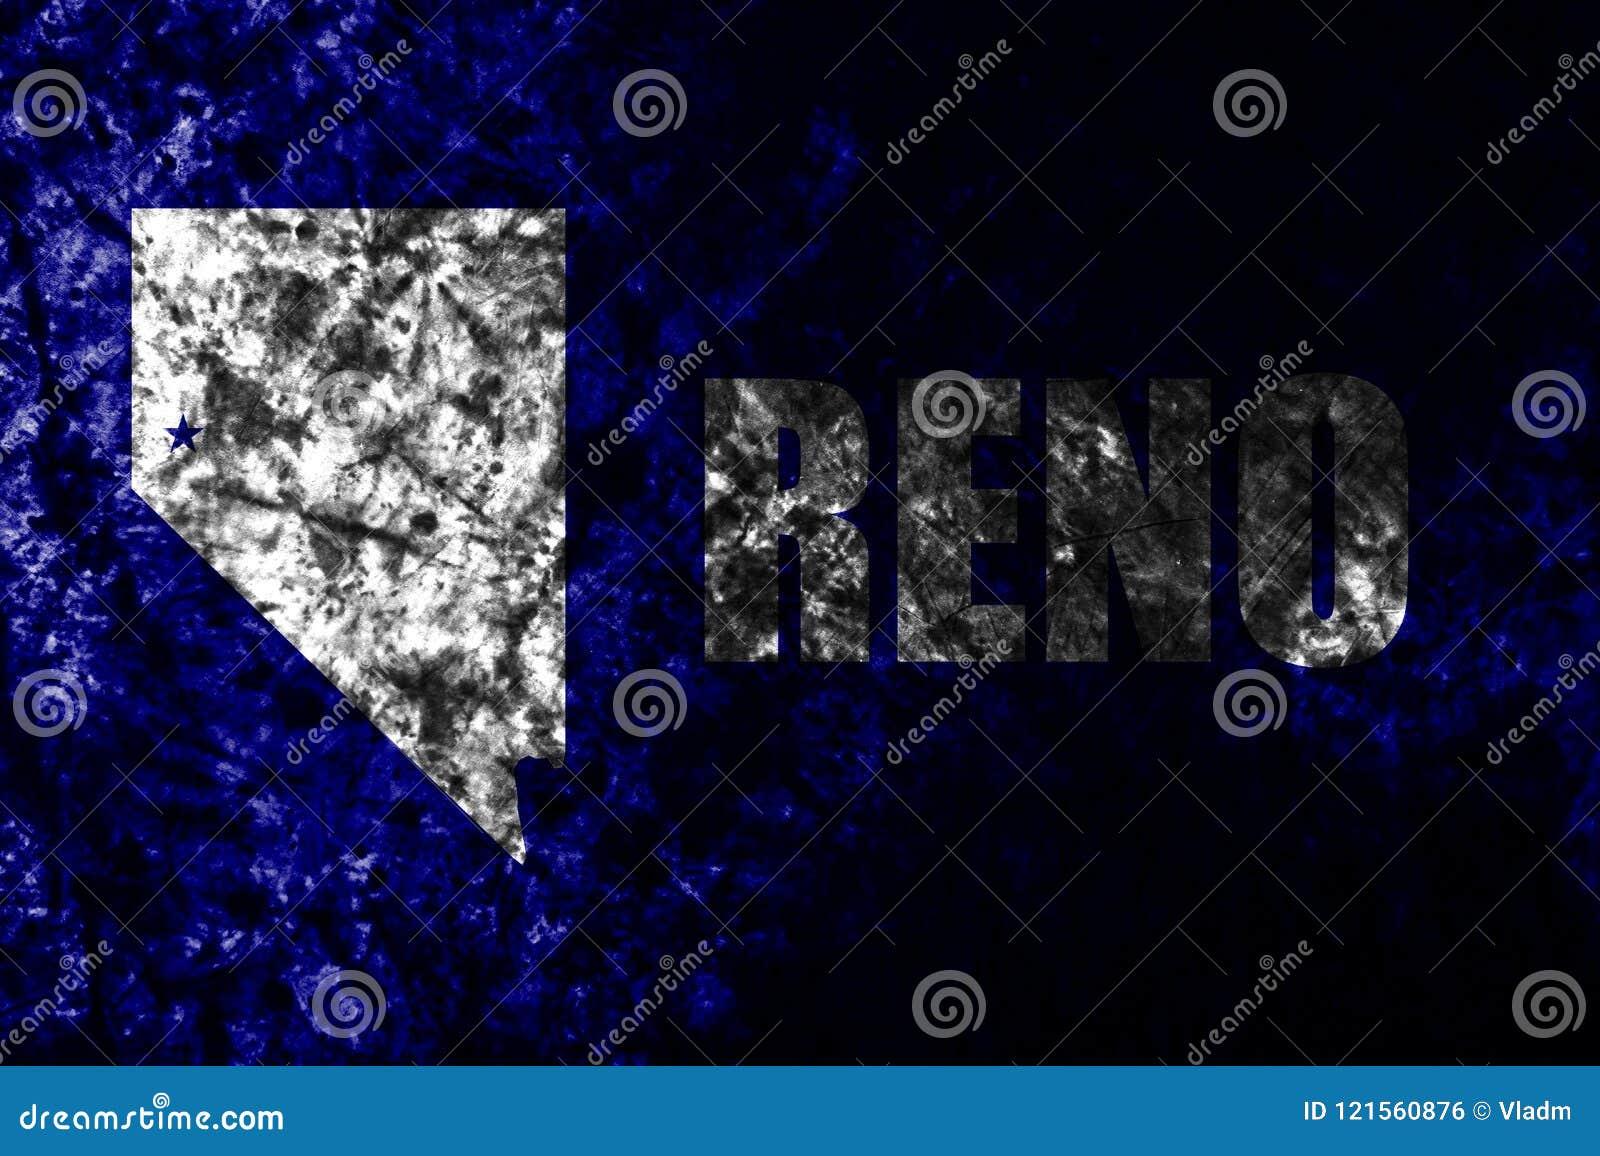 Bandeira velha do grunge da cidade de Reno, Nevada State, Estados Unidos da América